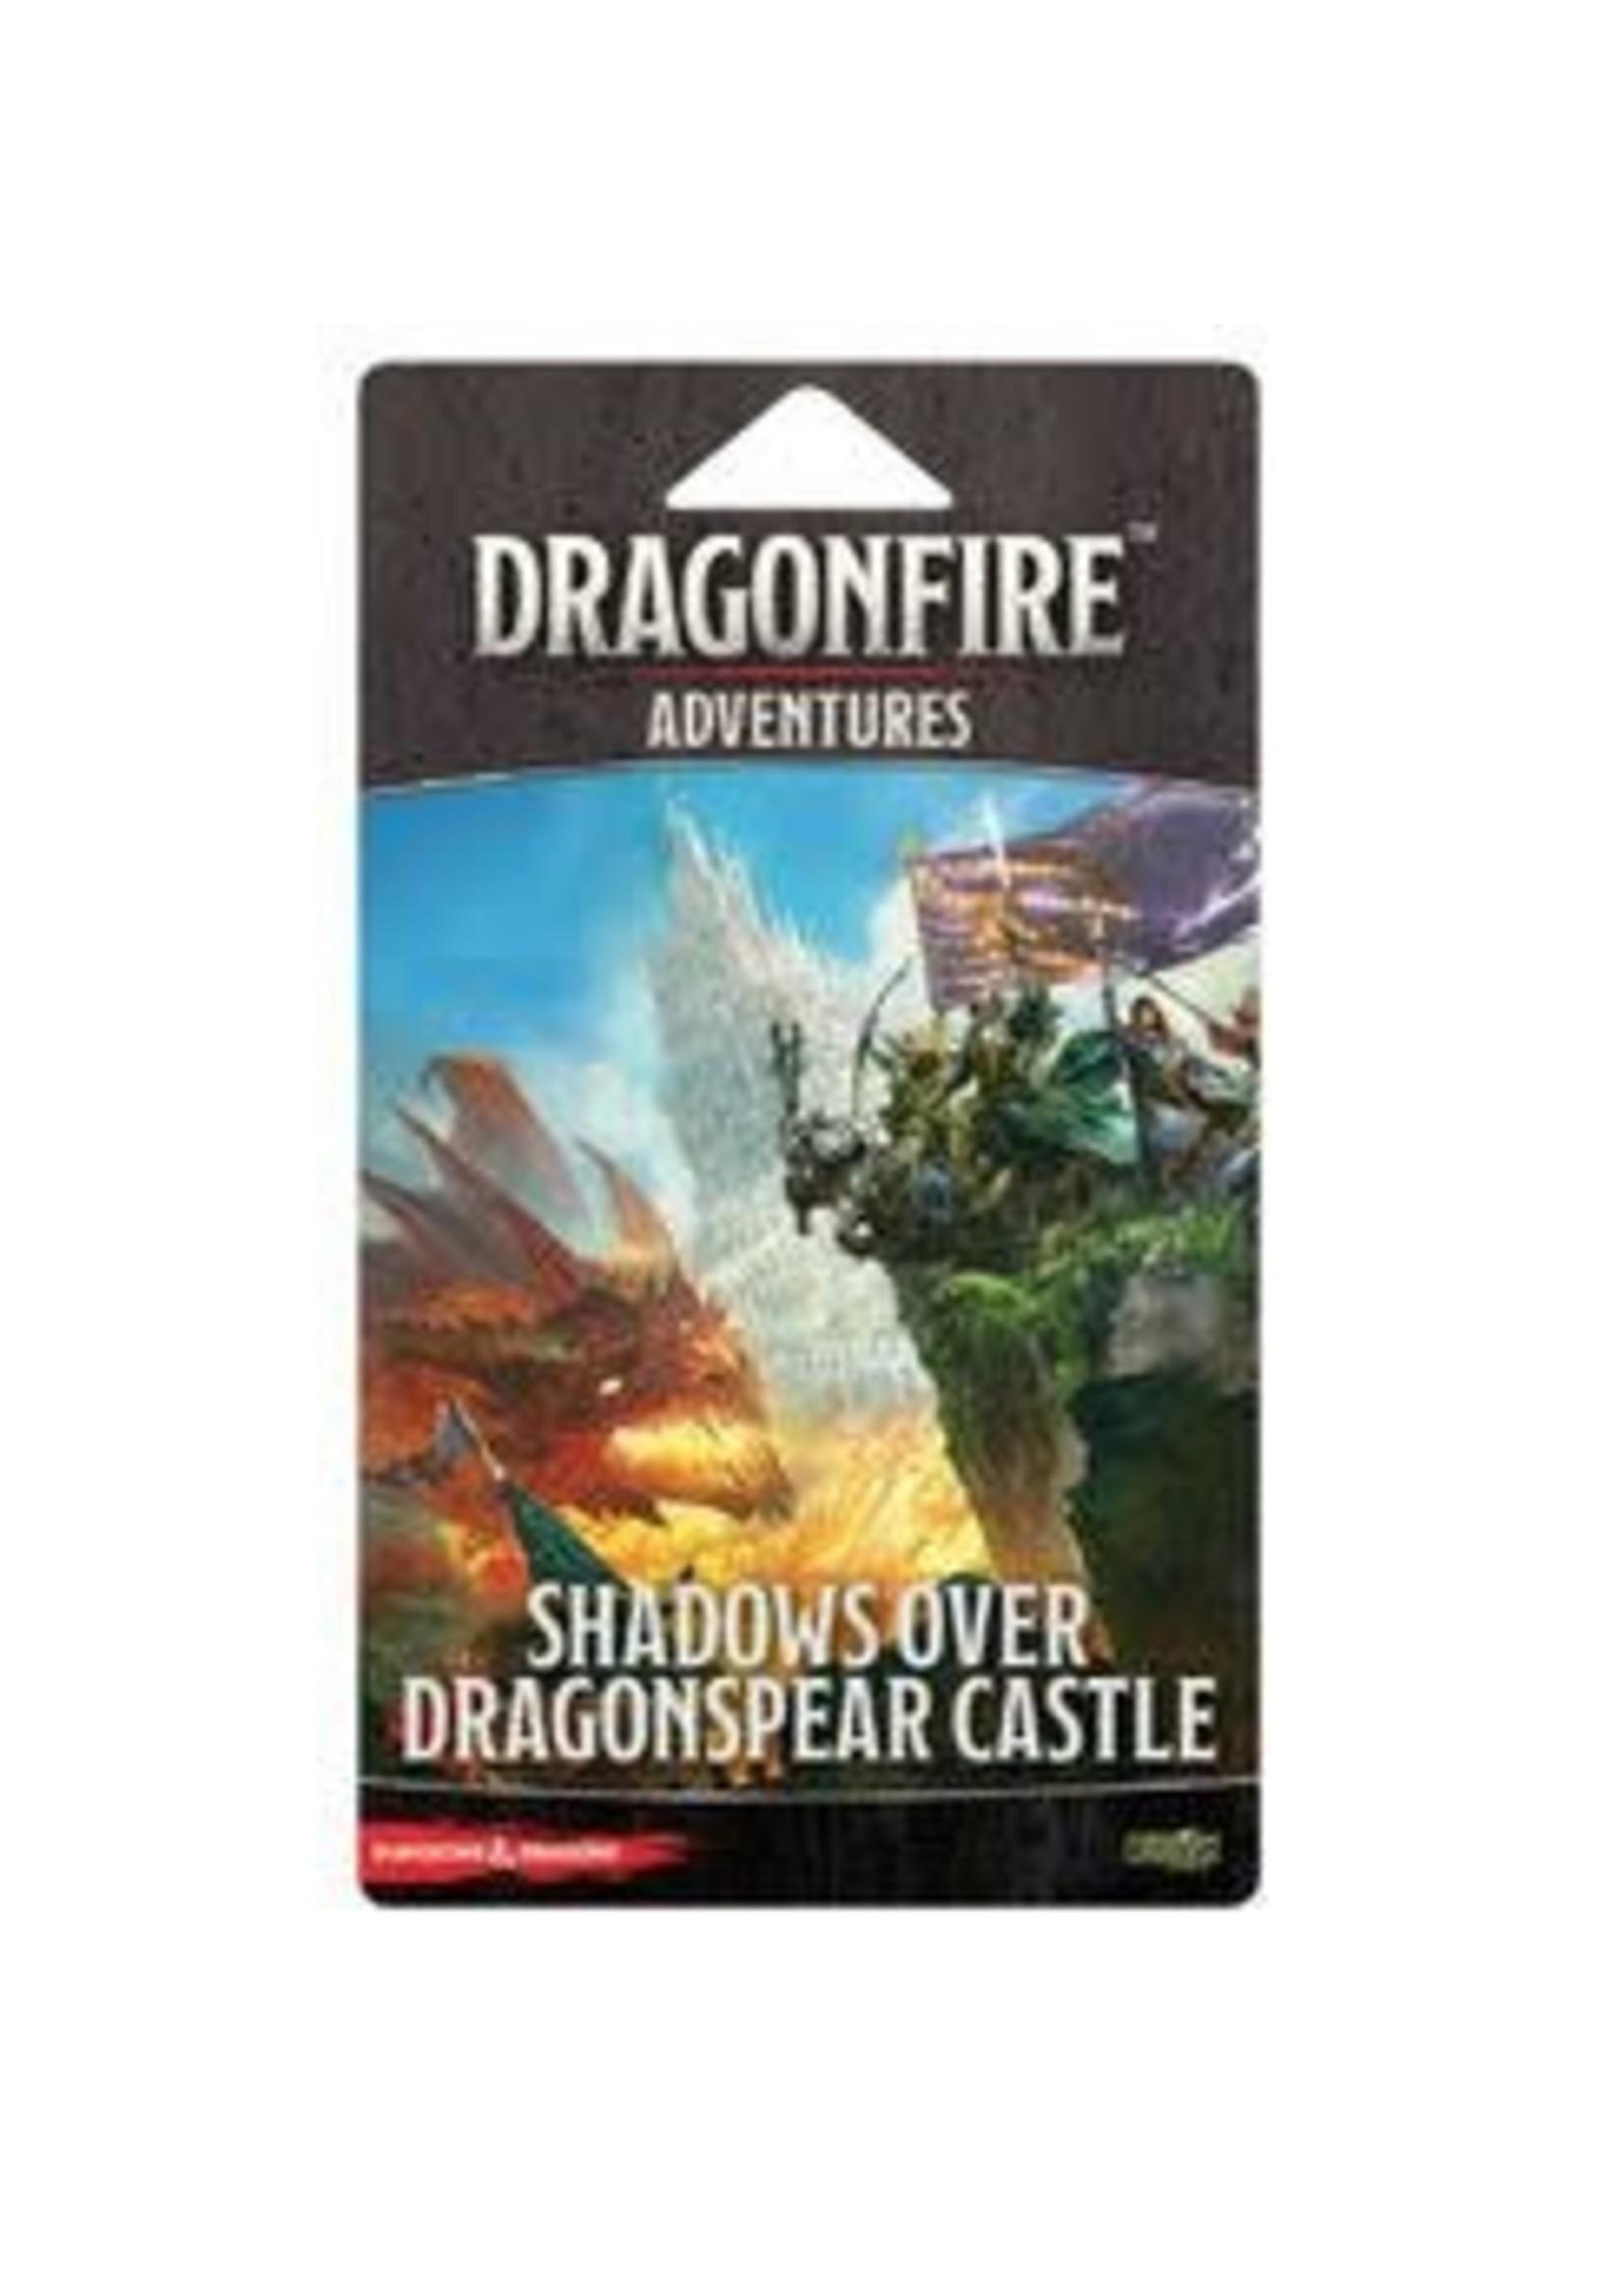 Dragonfire DBG Adventure: Shadows over Dragonspear Castle